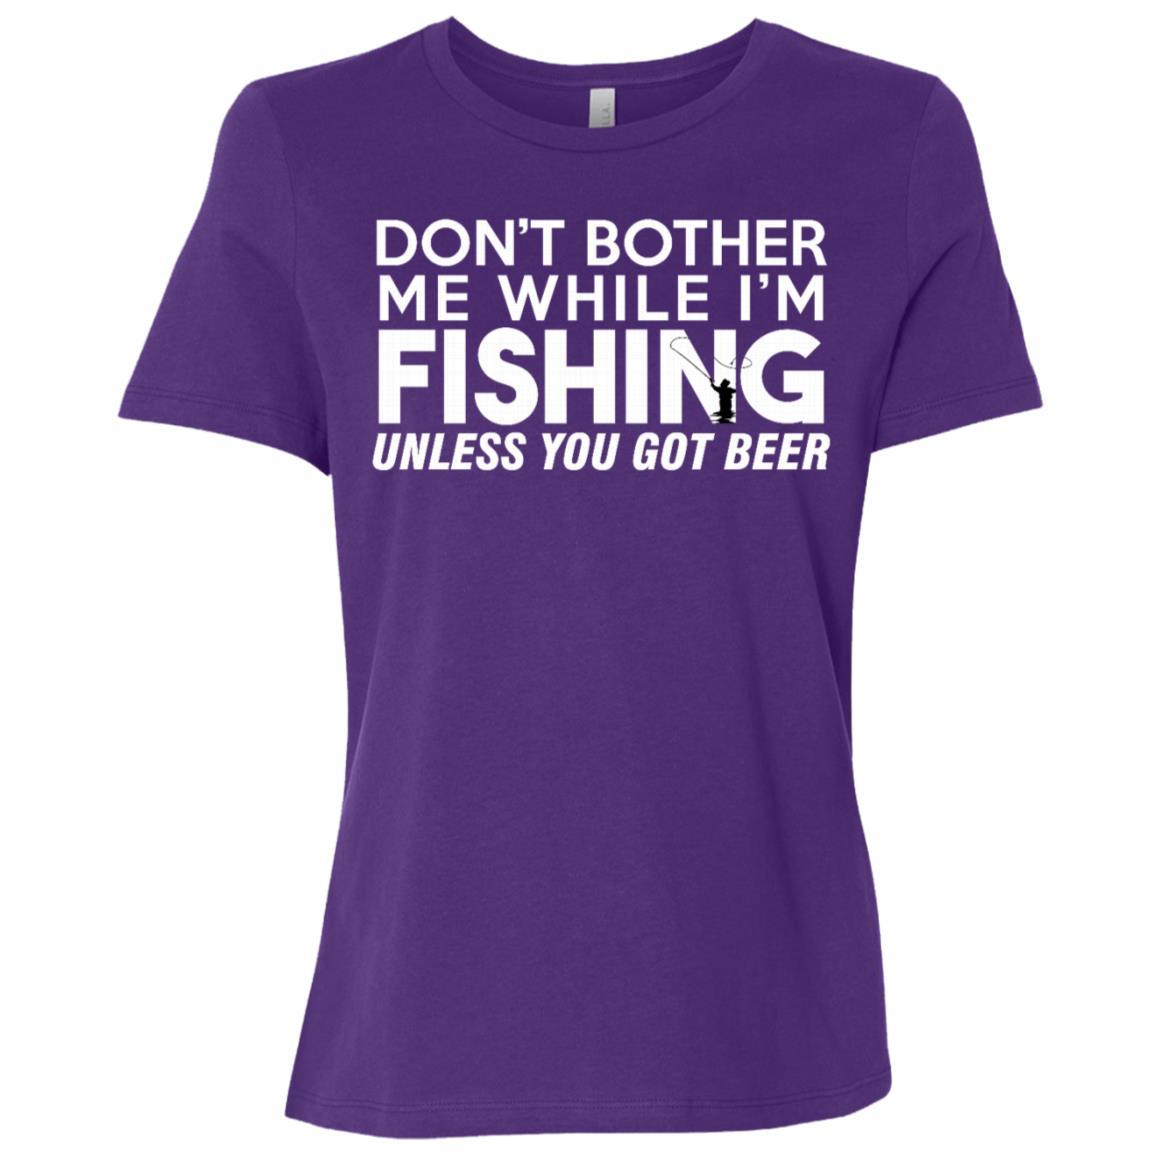 Fishing Funny Sarcasm Quotes Joke Hobbies Humor-1 Women Short Sleeve T-Shirt